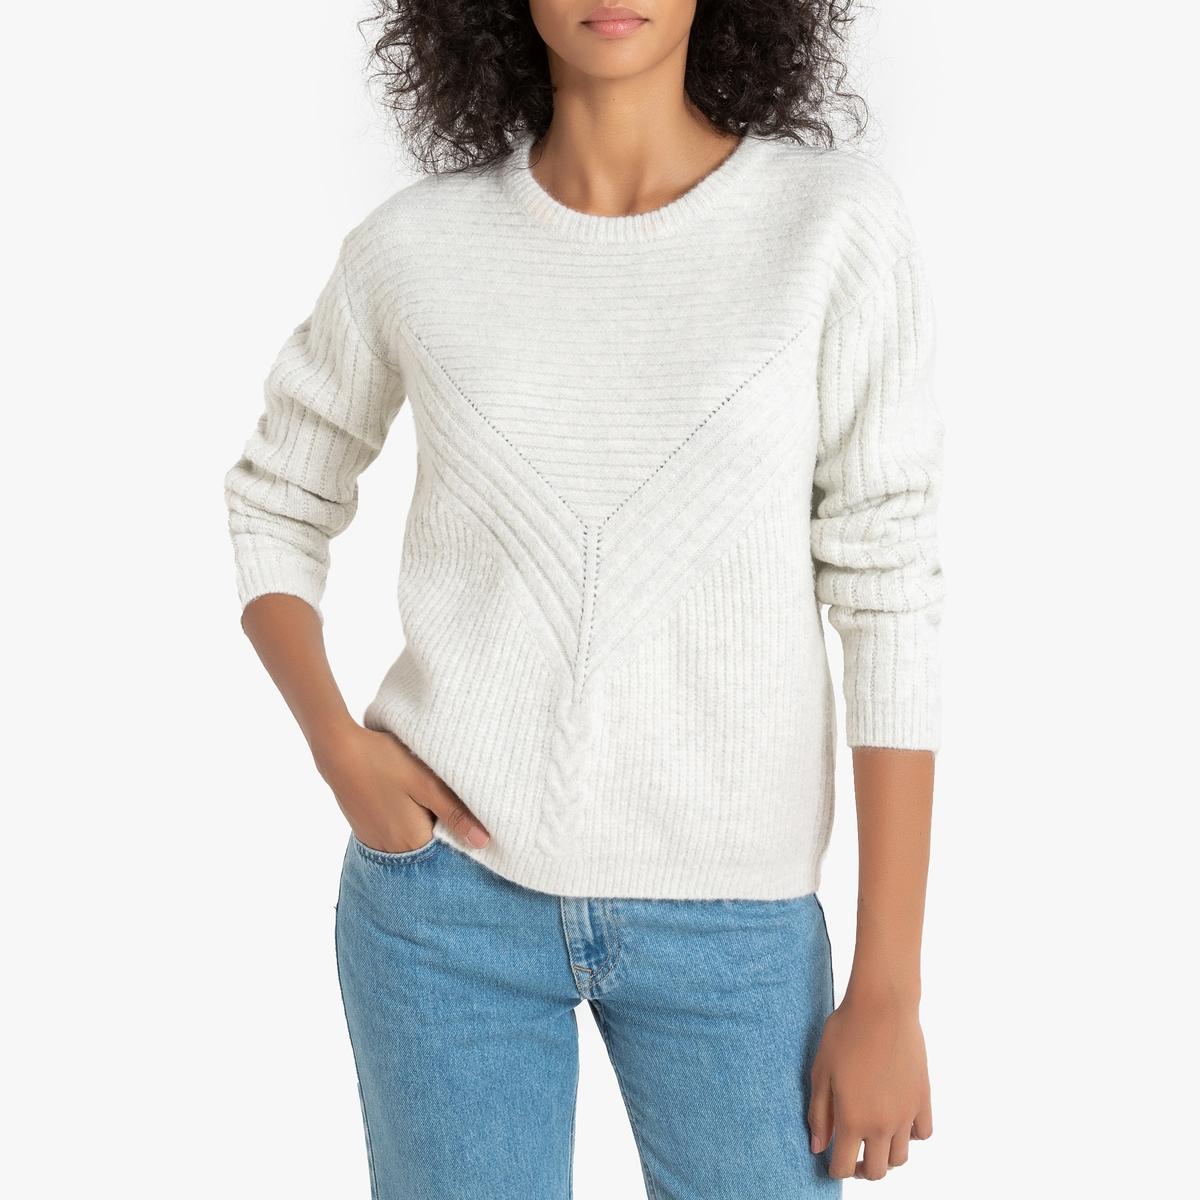 Пуловер La Redoute Из плотного трикотажа с круглым вырезом Maps S белый пуловер la redoute с круглым вырезом из плотного трикотажа 3xl бежевый